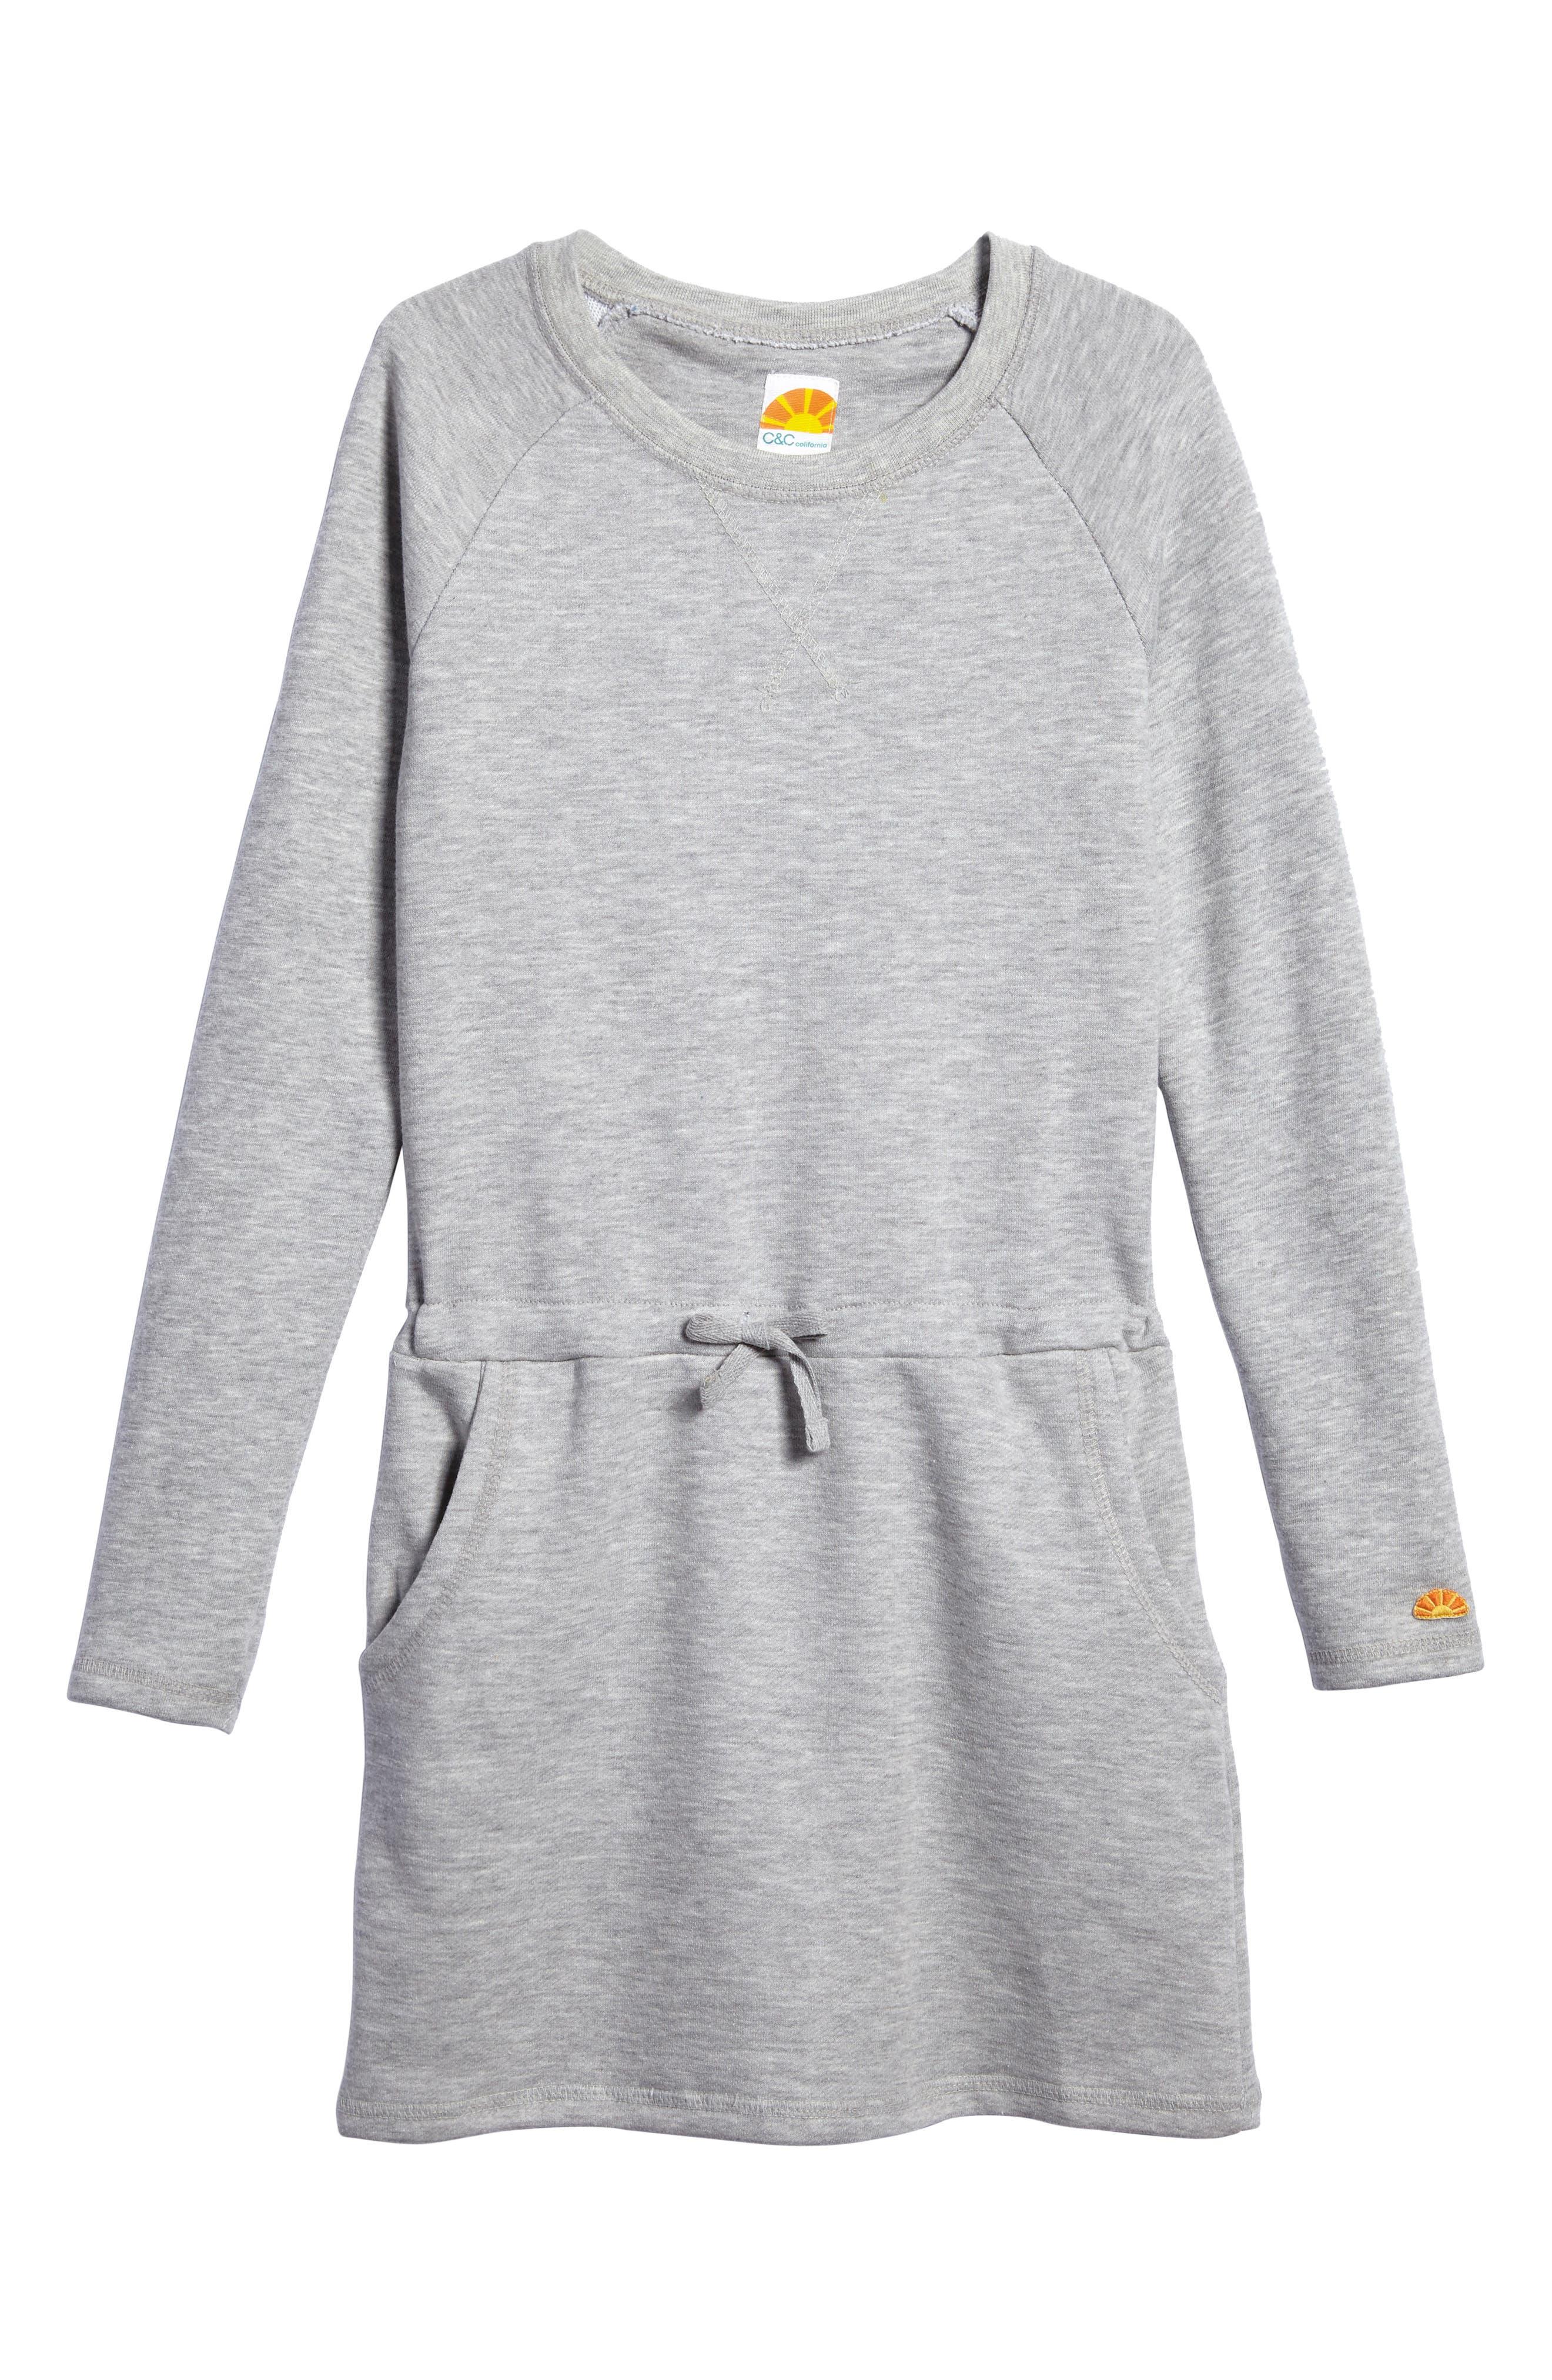 C & C California Sweatshirt Dress (Big Girls)